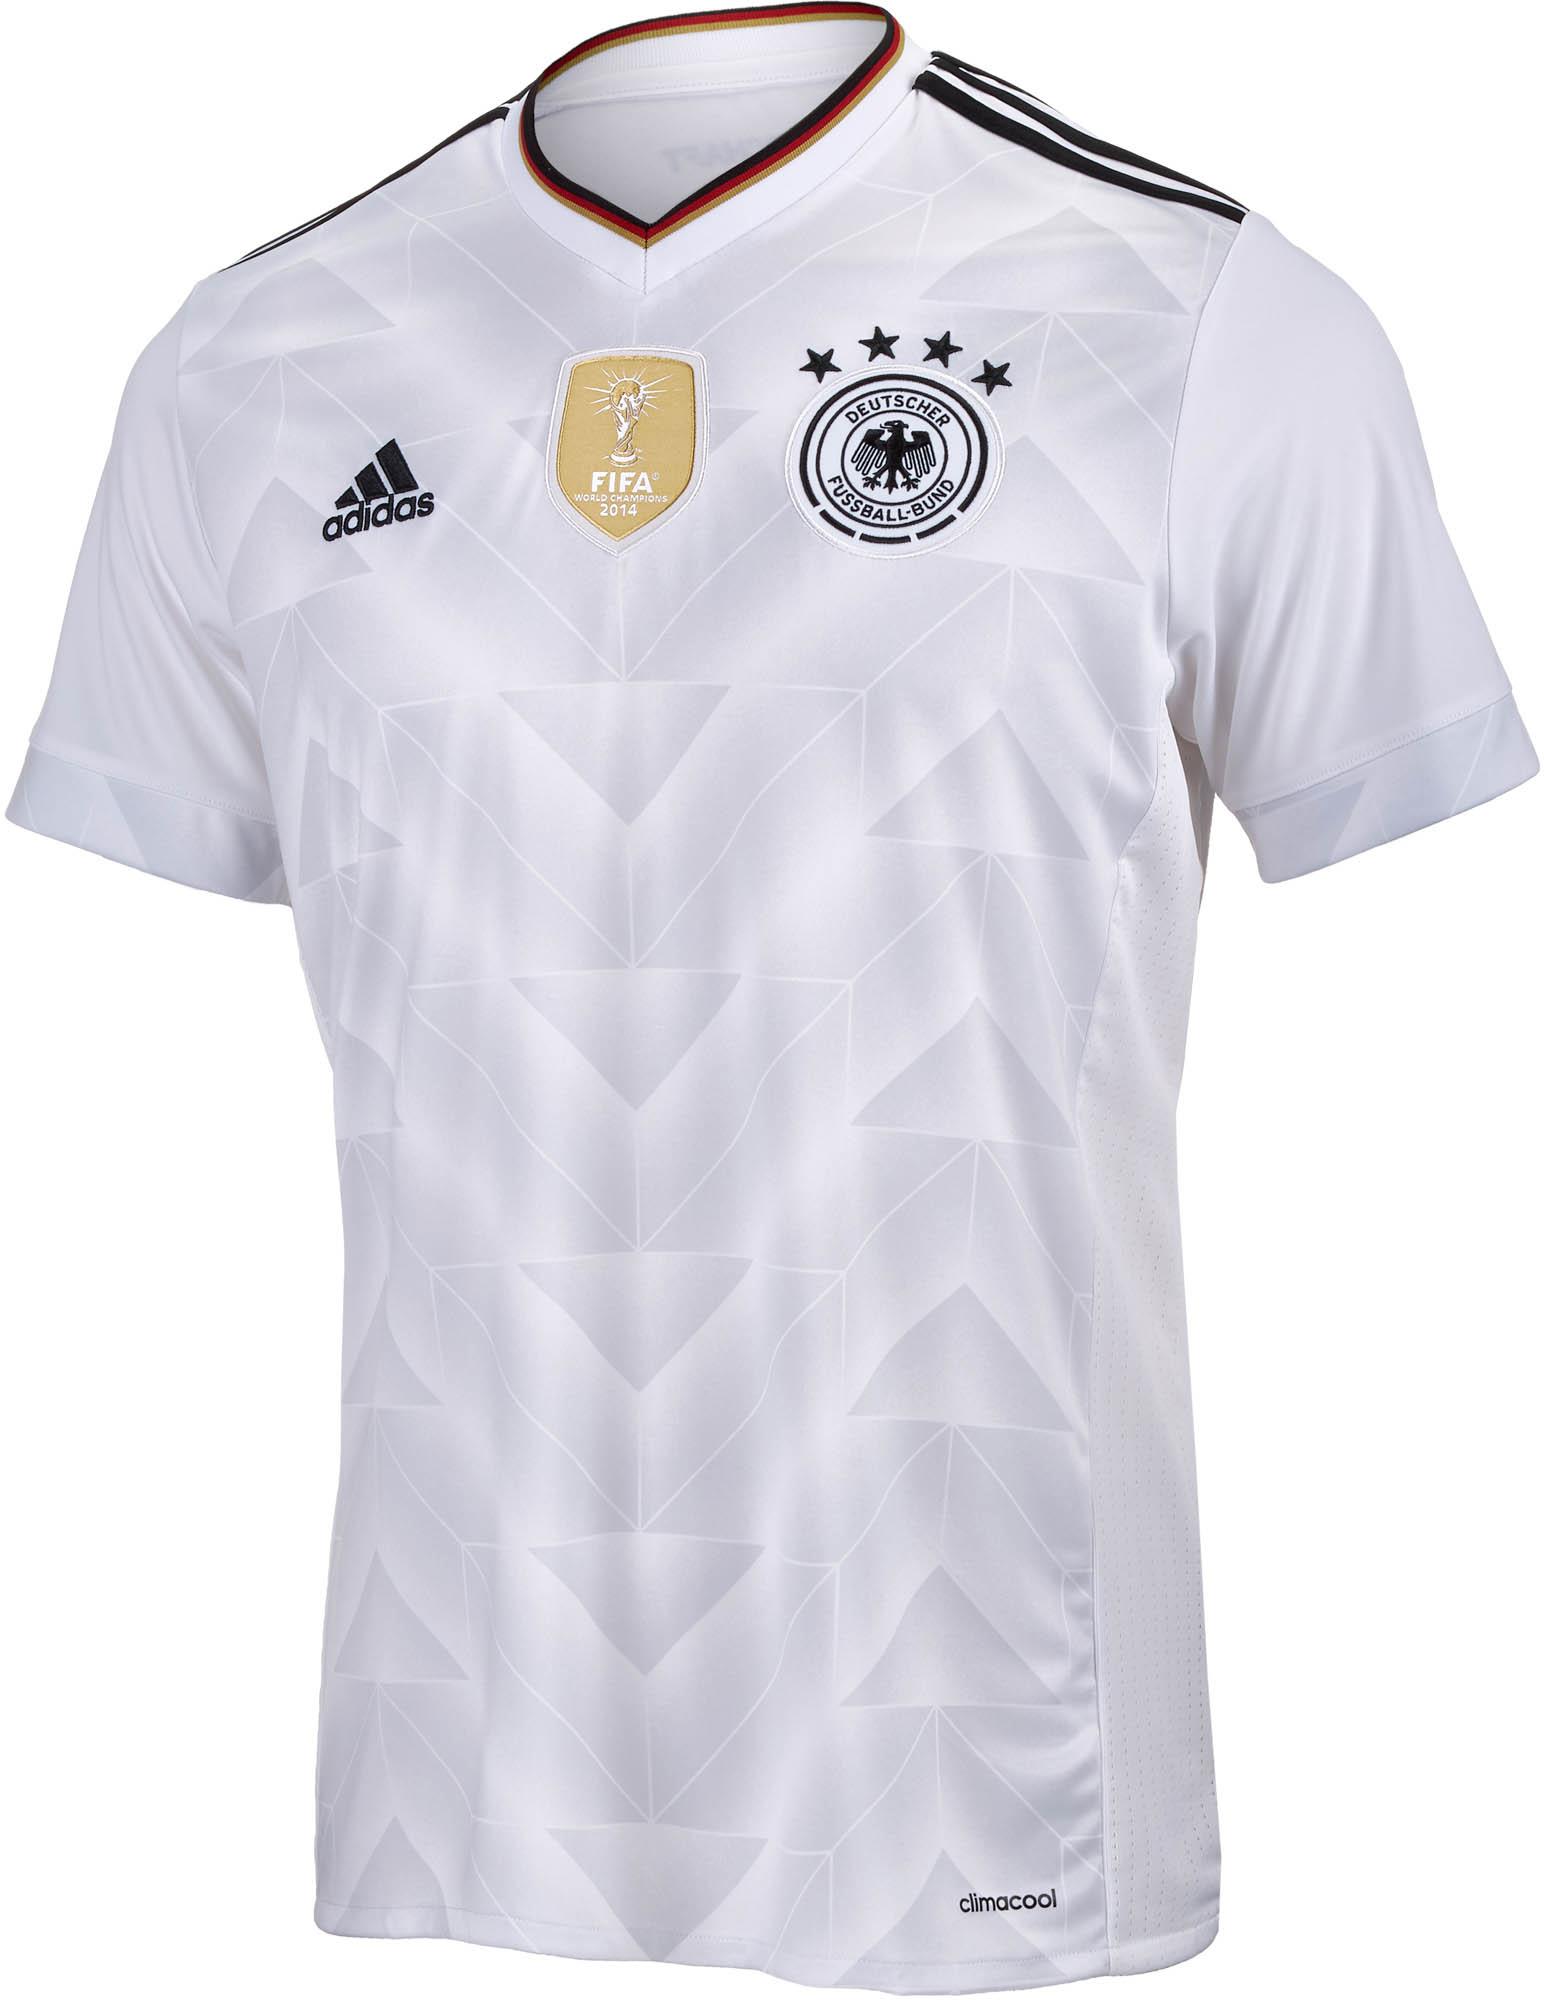 bfdbb5b2708 adidas Kids 2017/18 Germany Home Soccer Jerseys